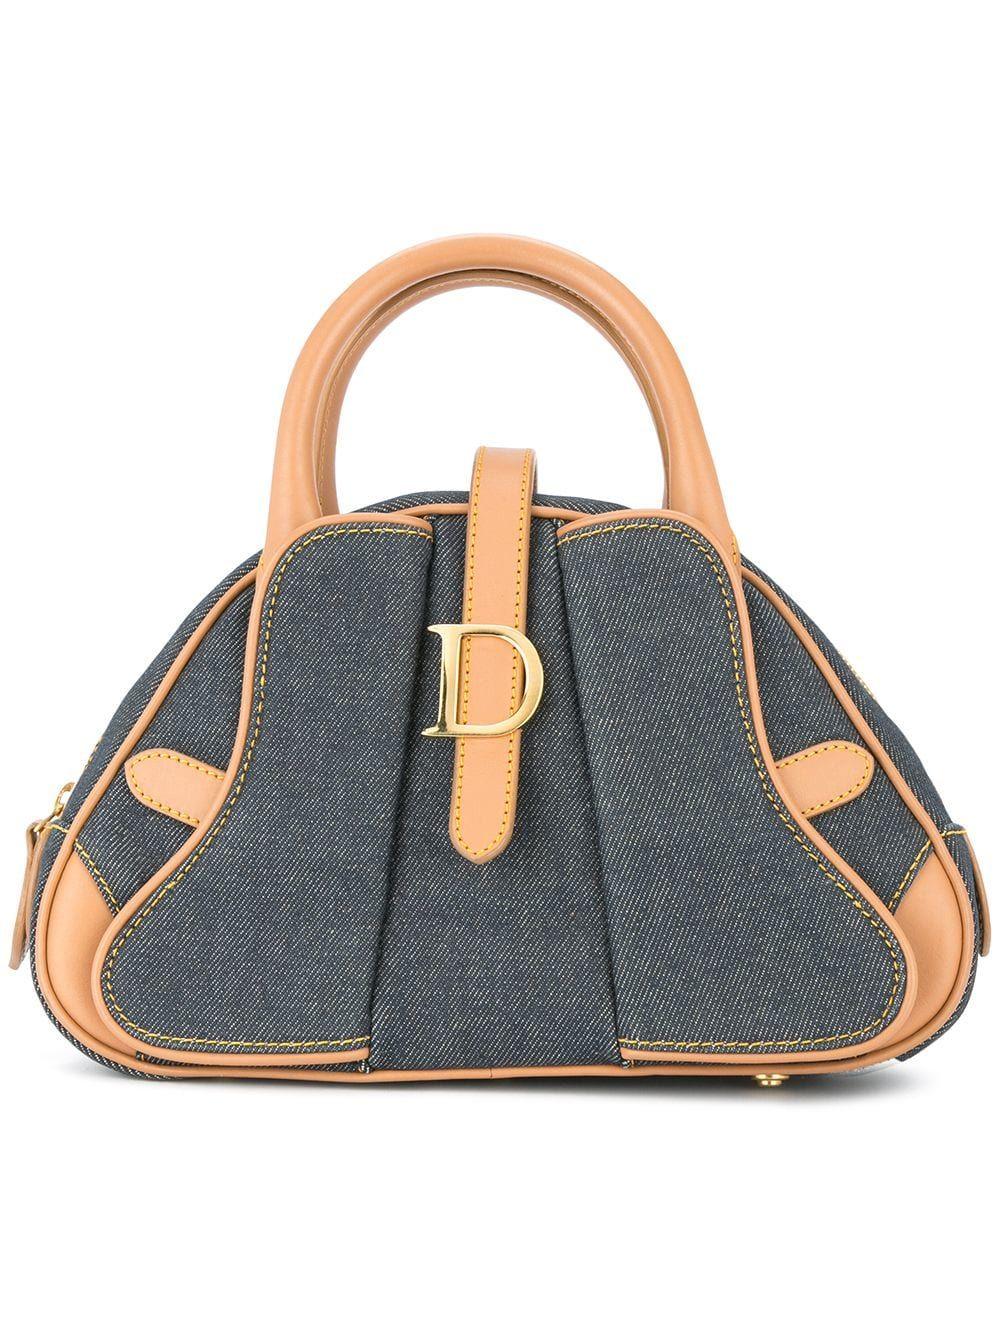 ae4aabb8f3b7 Christian Dior Vintage denim triangle bag | Cool handle bags ...